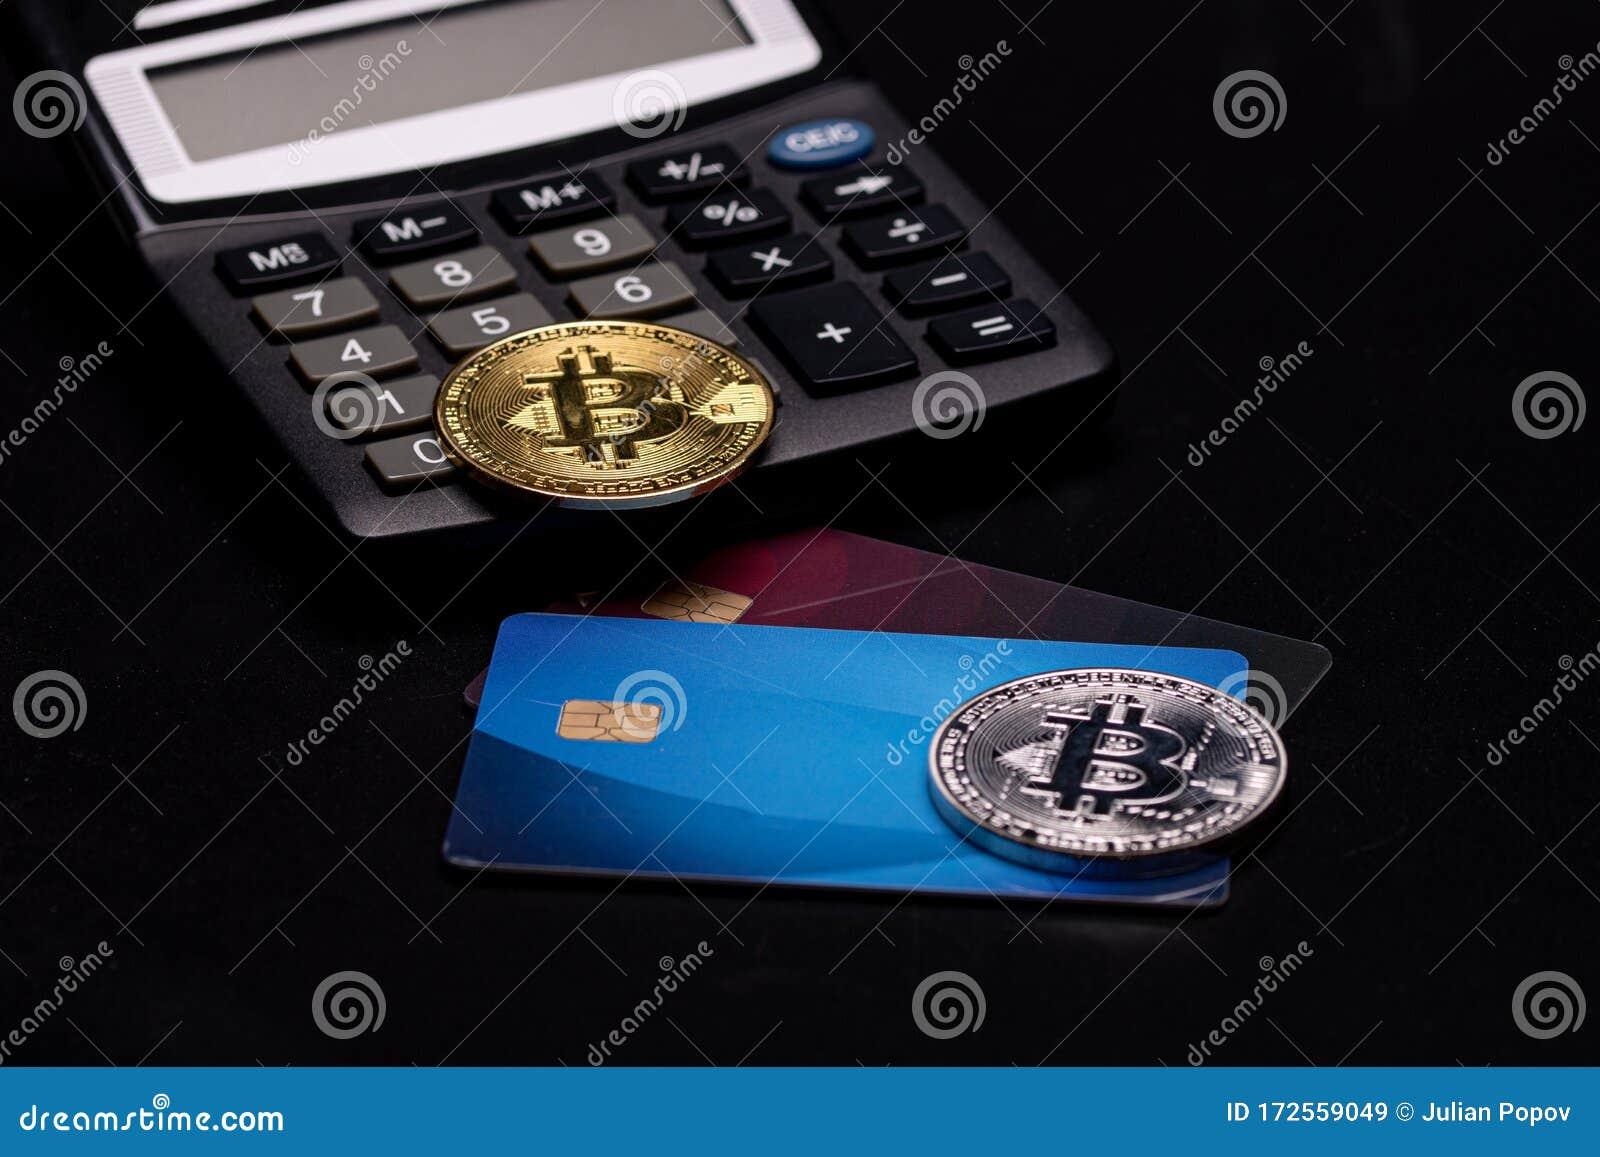 calculator cryptocurrency mining